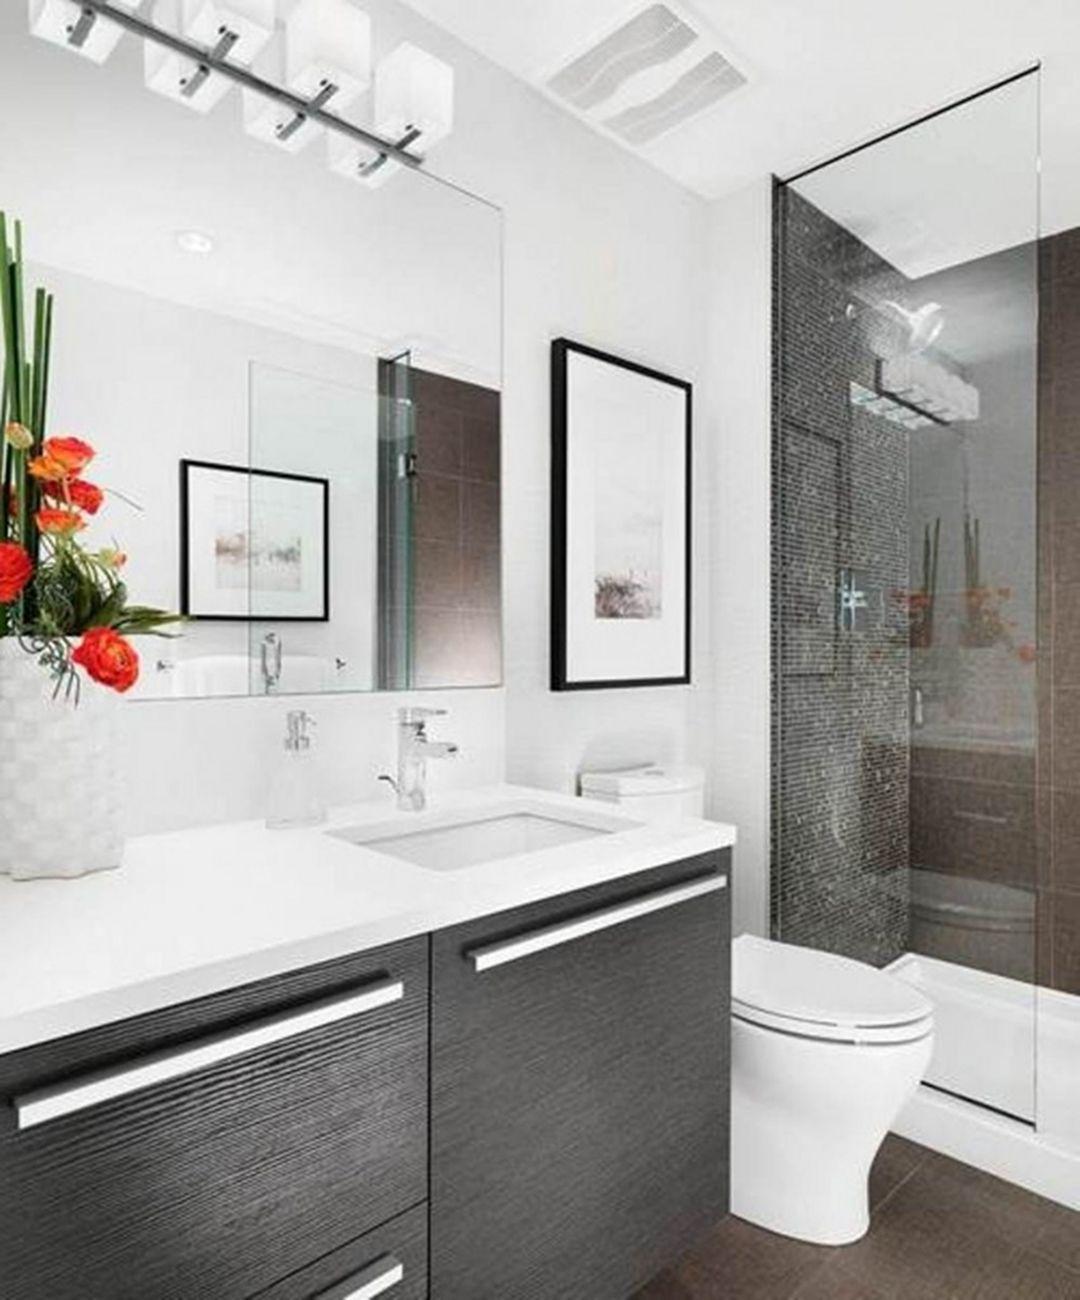 25 Attractive Modern Small Bathroom Designs For Awesome Home Bathroom Design Small Modern Modern Small Bathrooms Bathroom Renovation Small Space